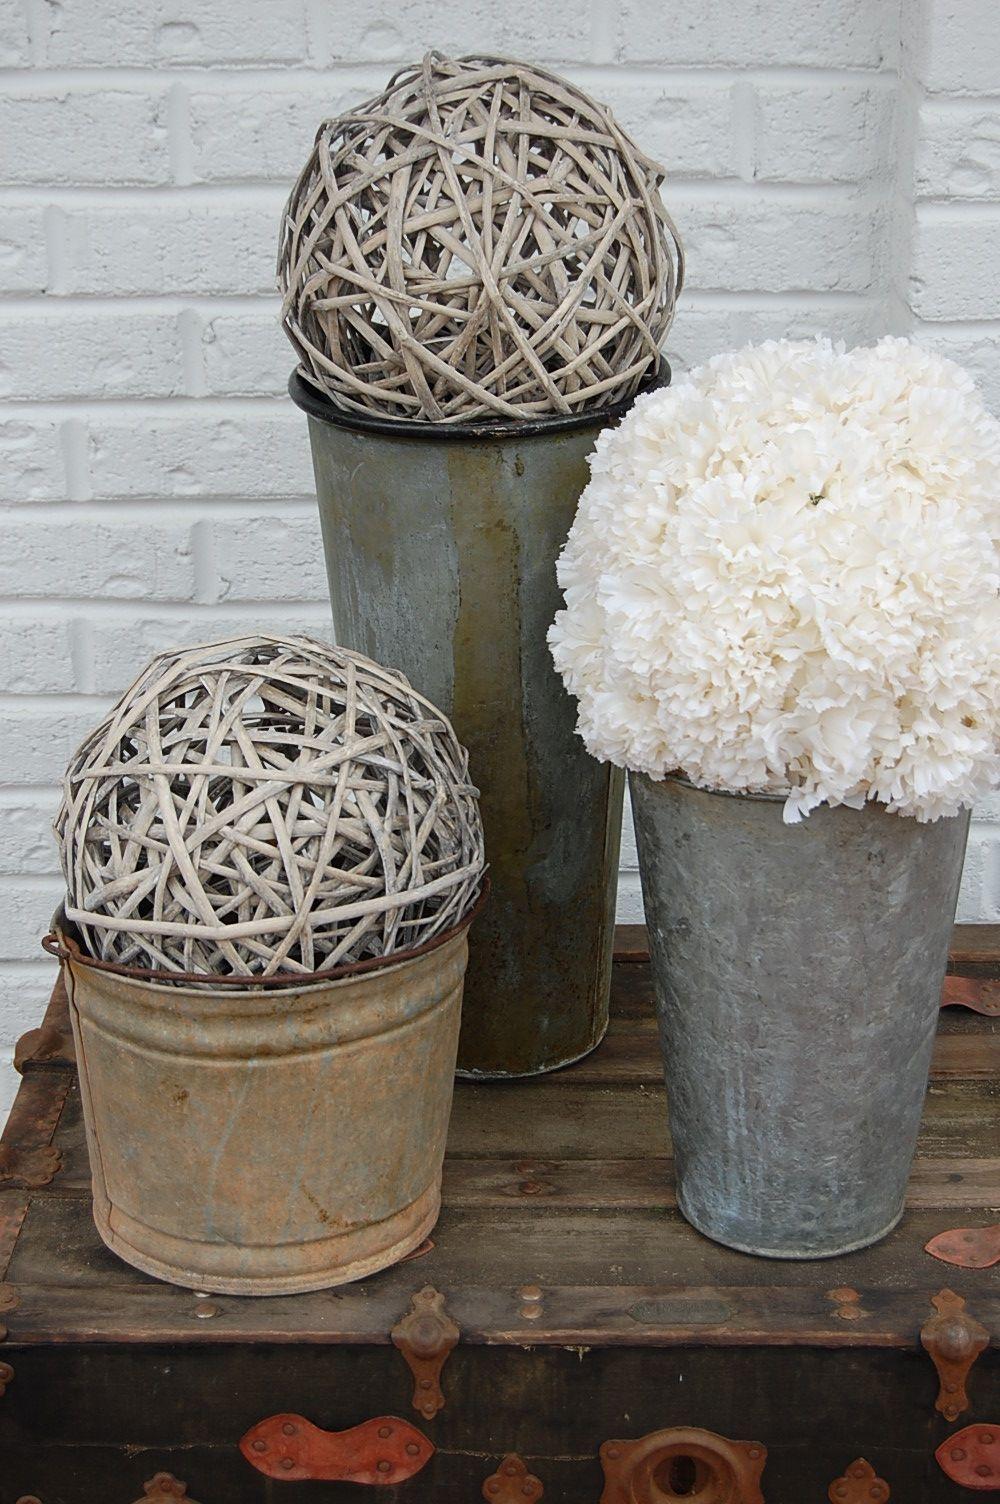 Wedding decoration ideas rustic  Rustic Wedding Centerpiece Ideas  Select your favorite flower or